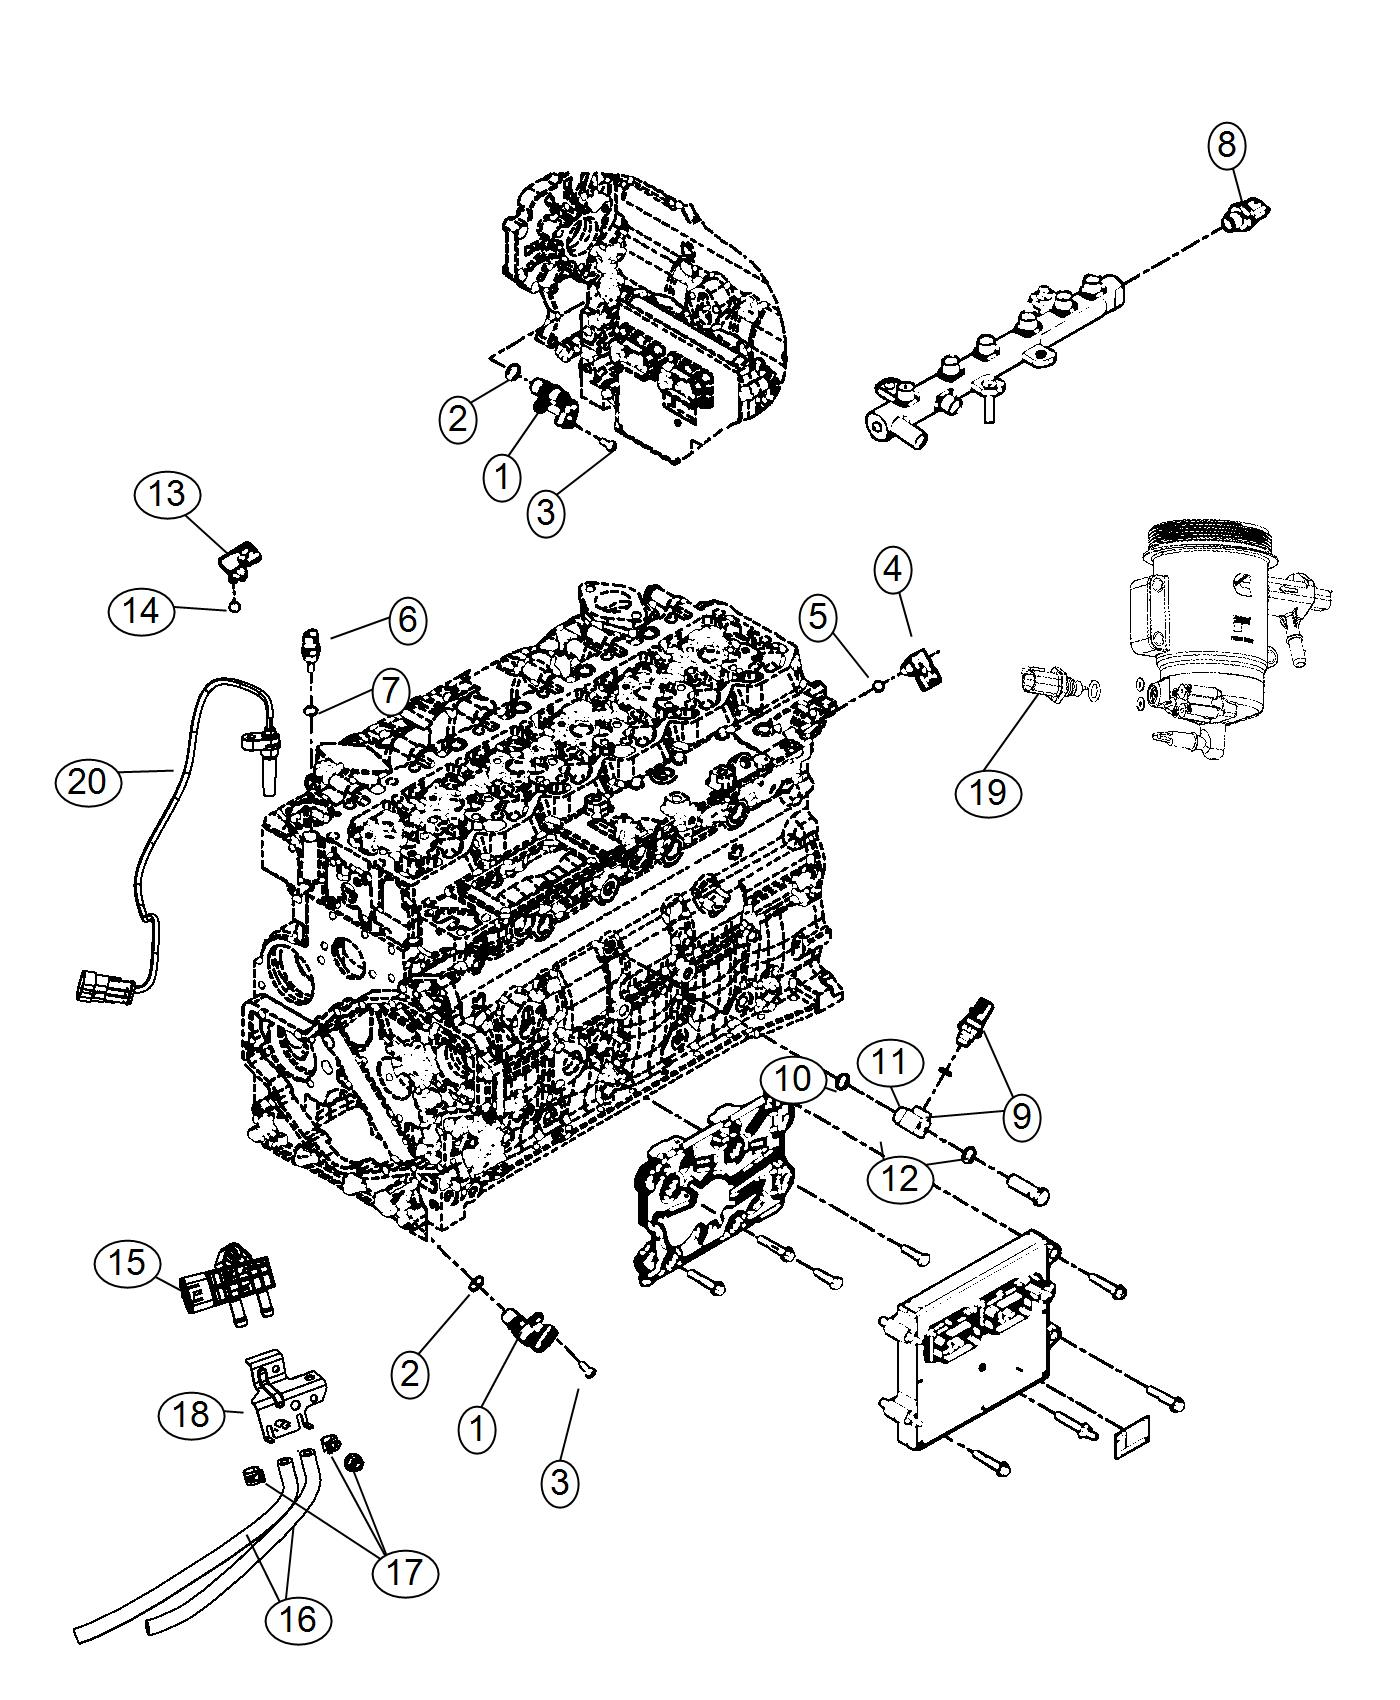 2011 Dodge Ram 5500 Sensor, speed sensor kit. Turbo speed